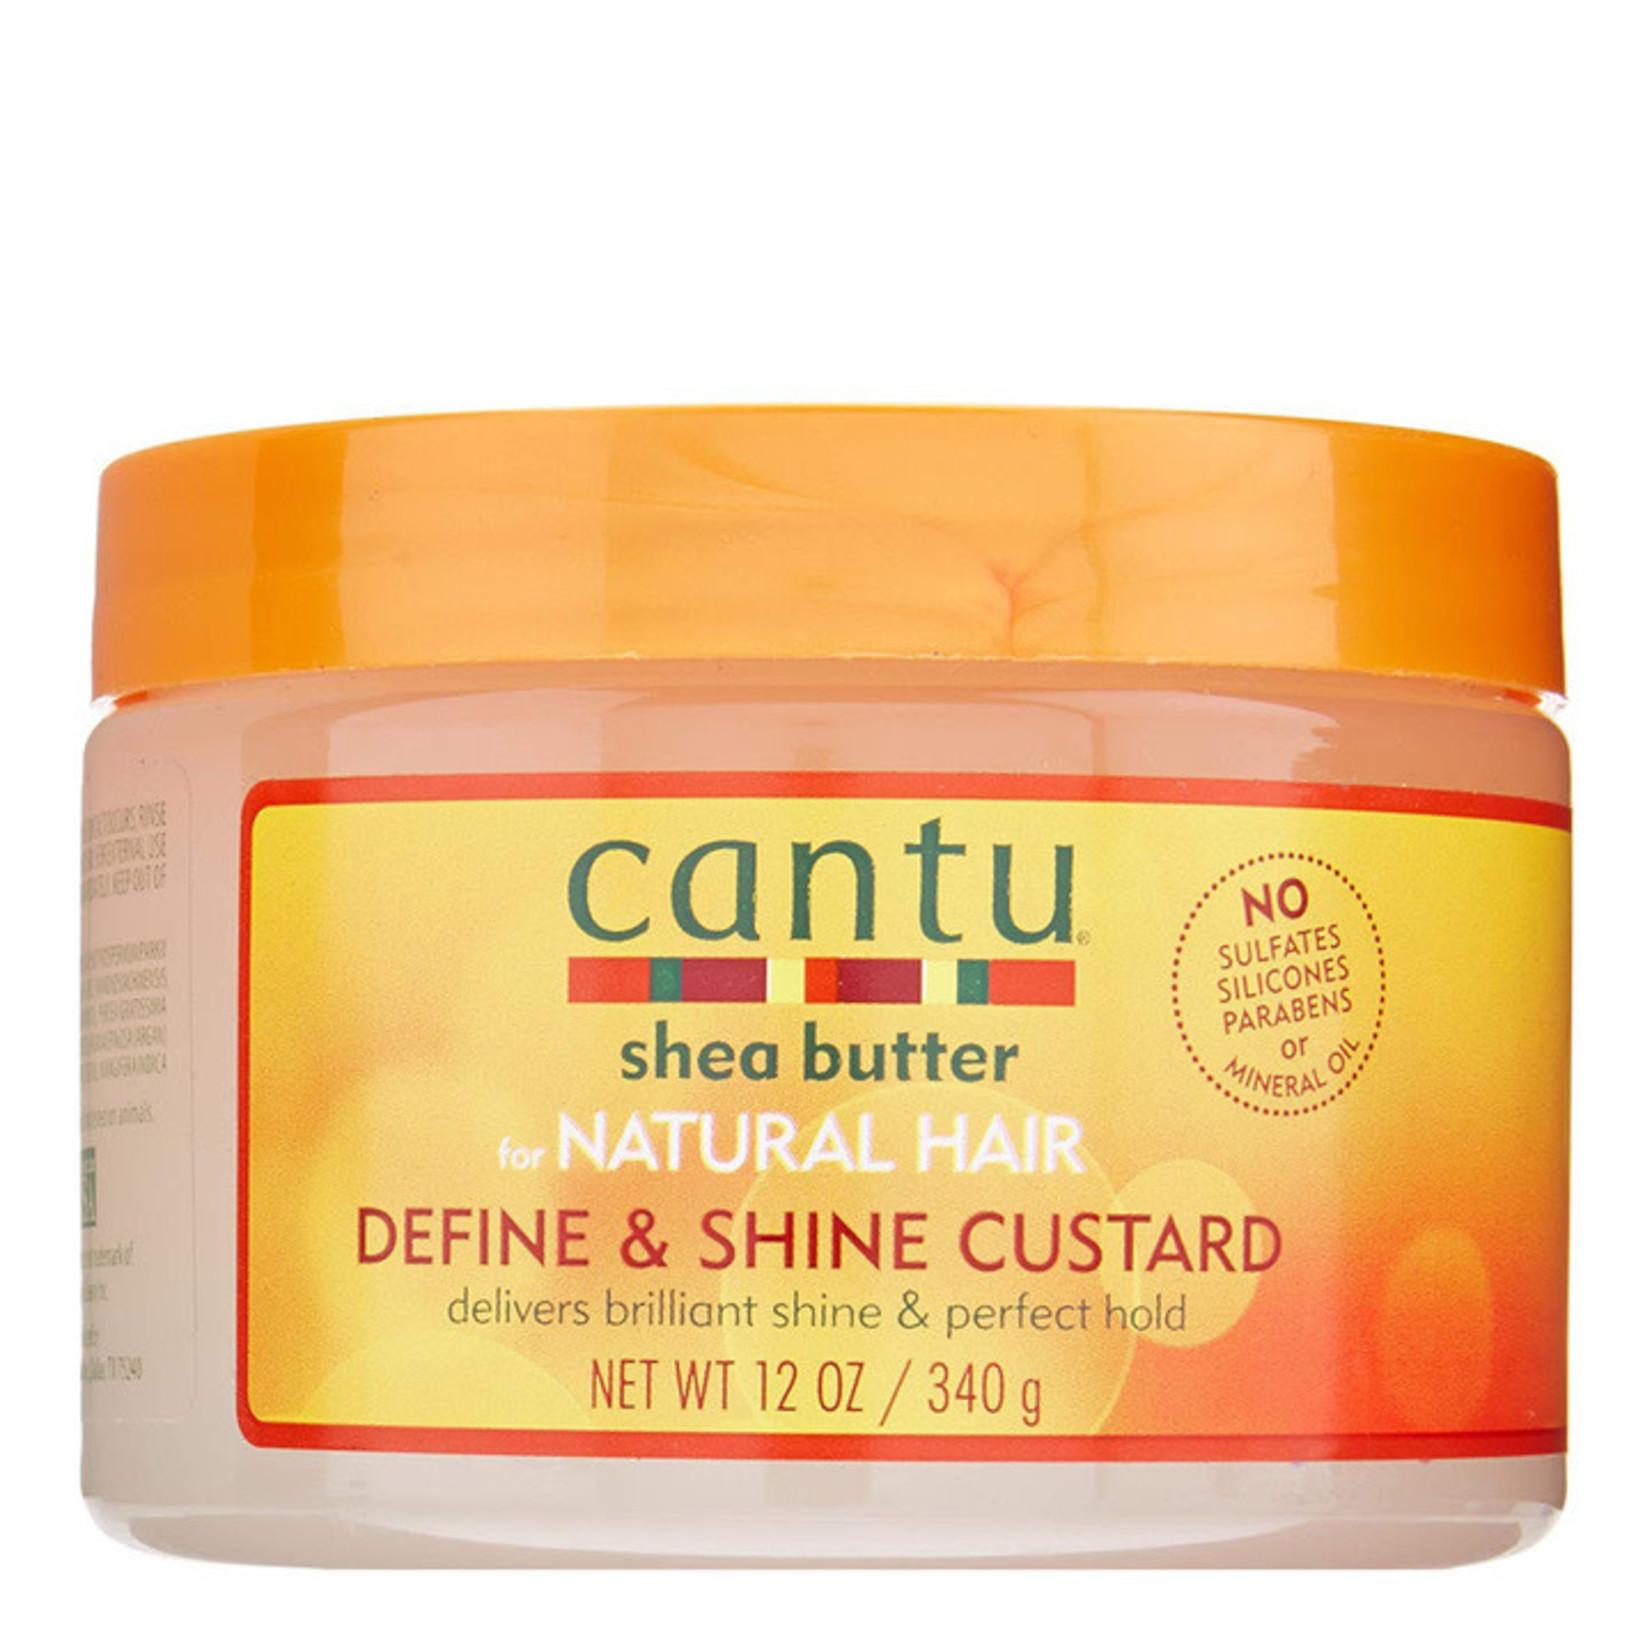 CANTU CANTU NATURAL HAIR DEFINE&SHINE CUSTARD [12OZ]